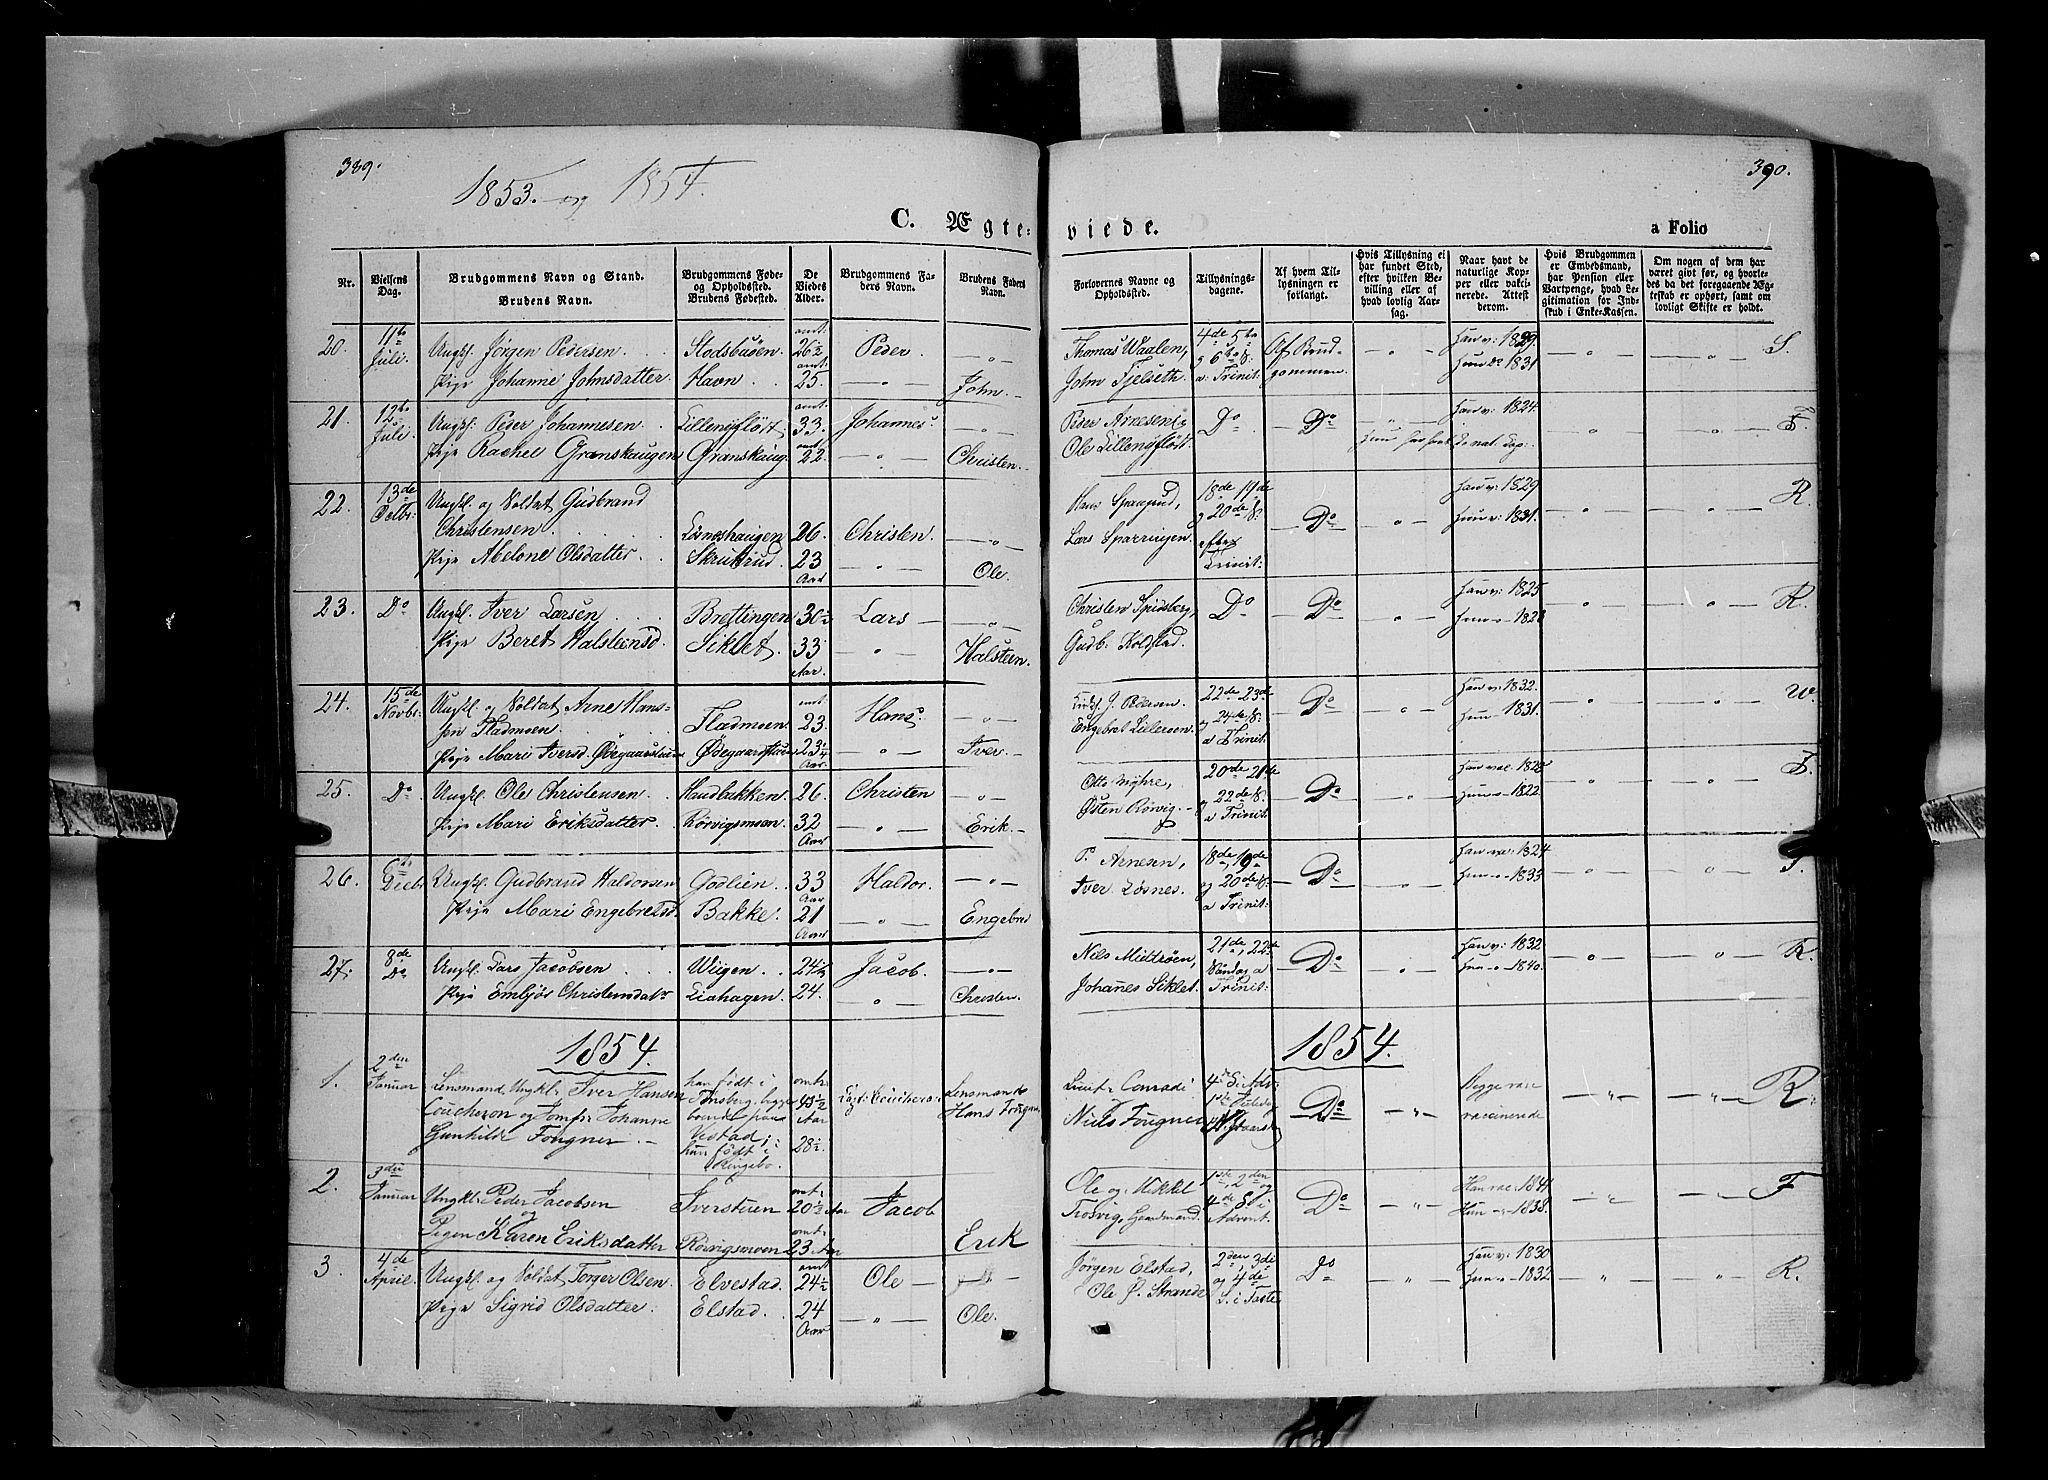 SAH, Ringebu prestekontor, Ministerialbok nr. 6, 1848-1859, s. 389-390